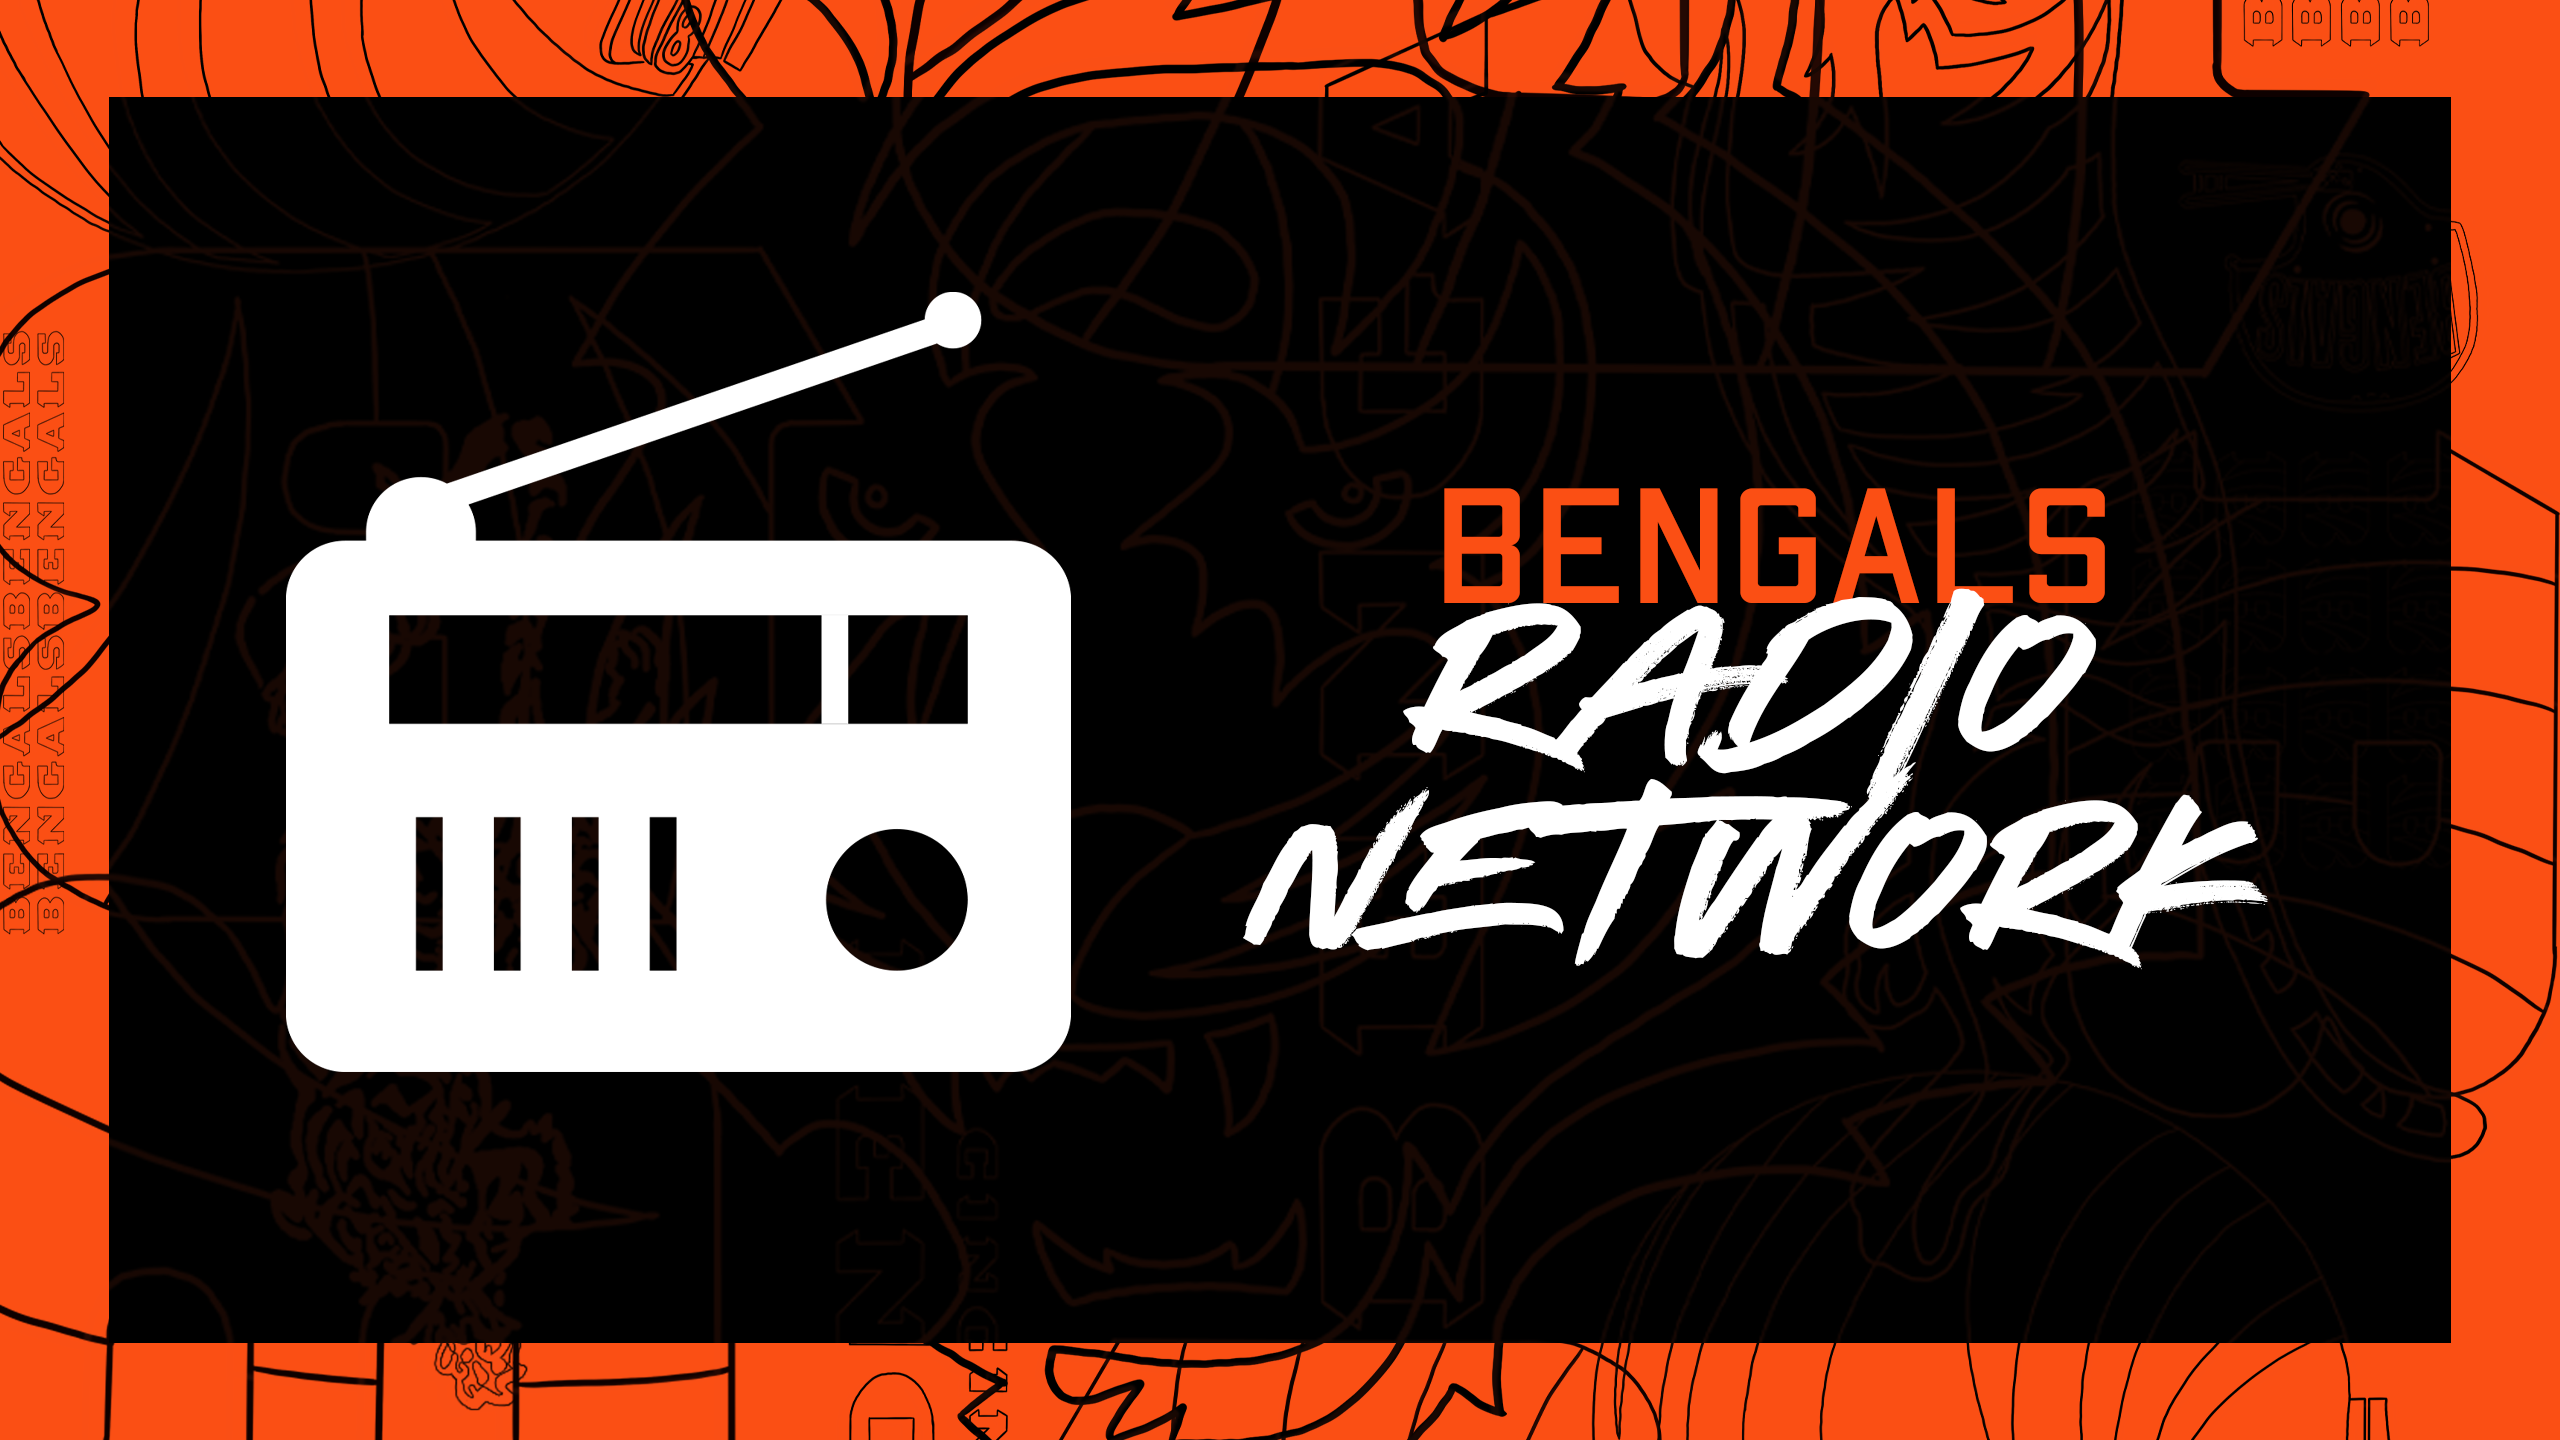 Bengals Radio Network